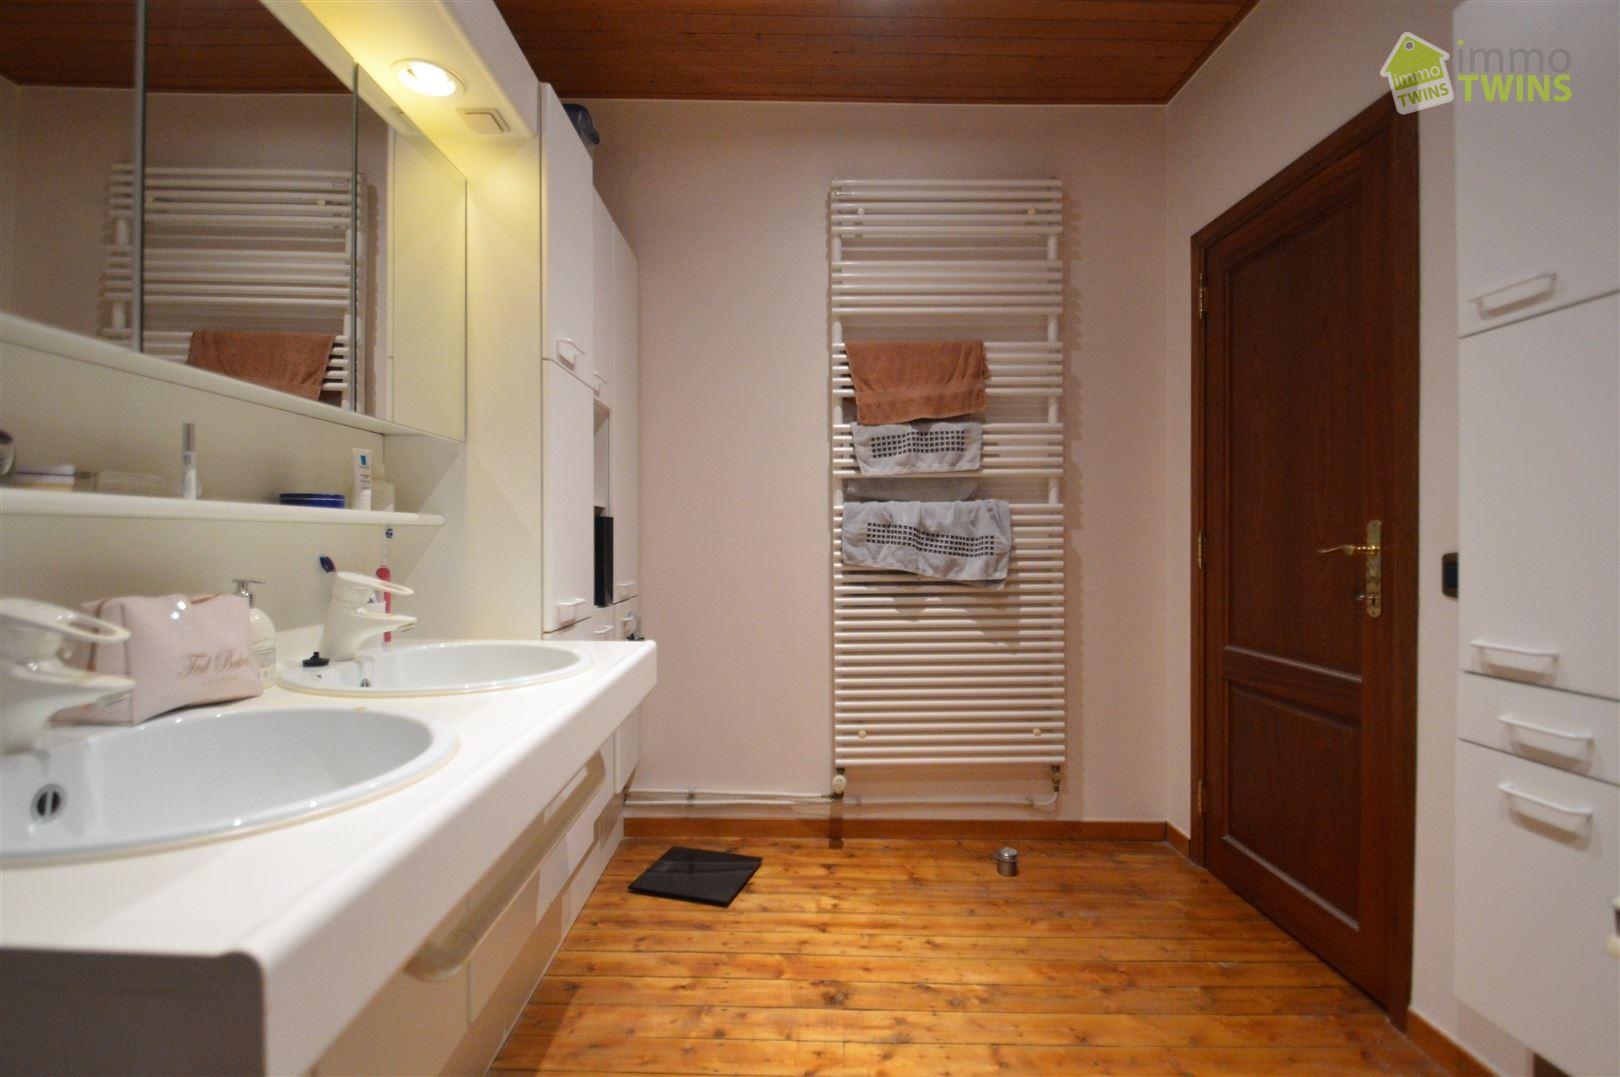 Foto 18 : Duplex/Penthouse te 2890 SINT-AMANDS (België) - Prijs € 429.000